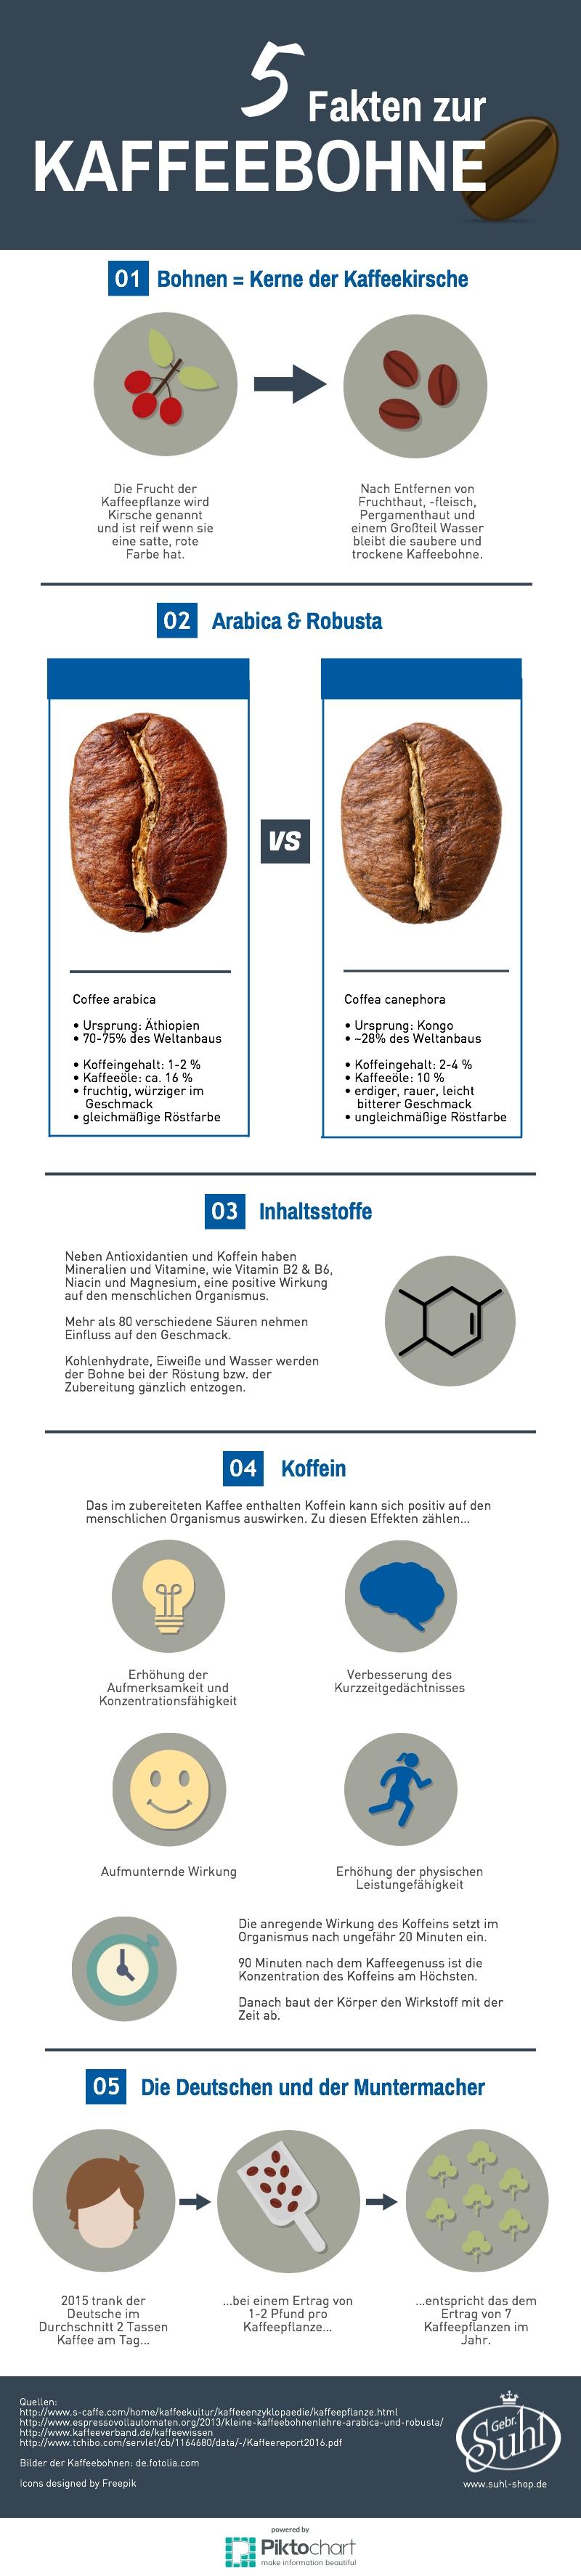 Infografik: 5 Fakten zur Kaffeebohne